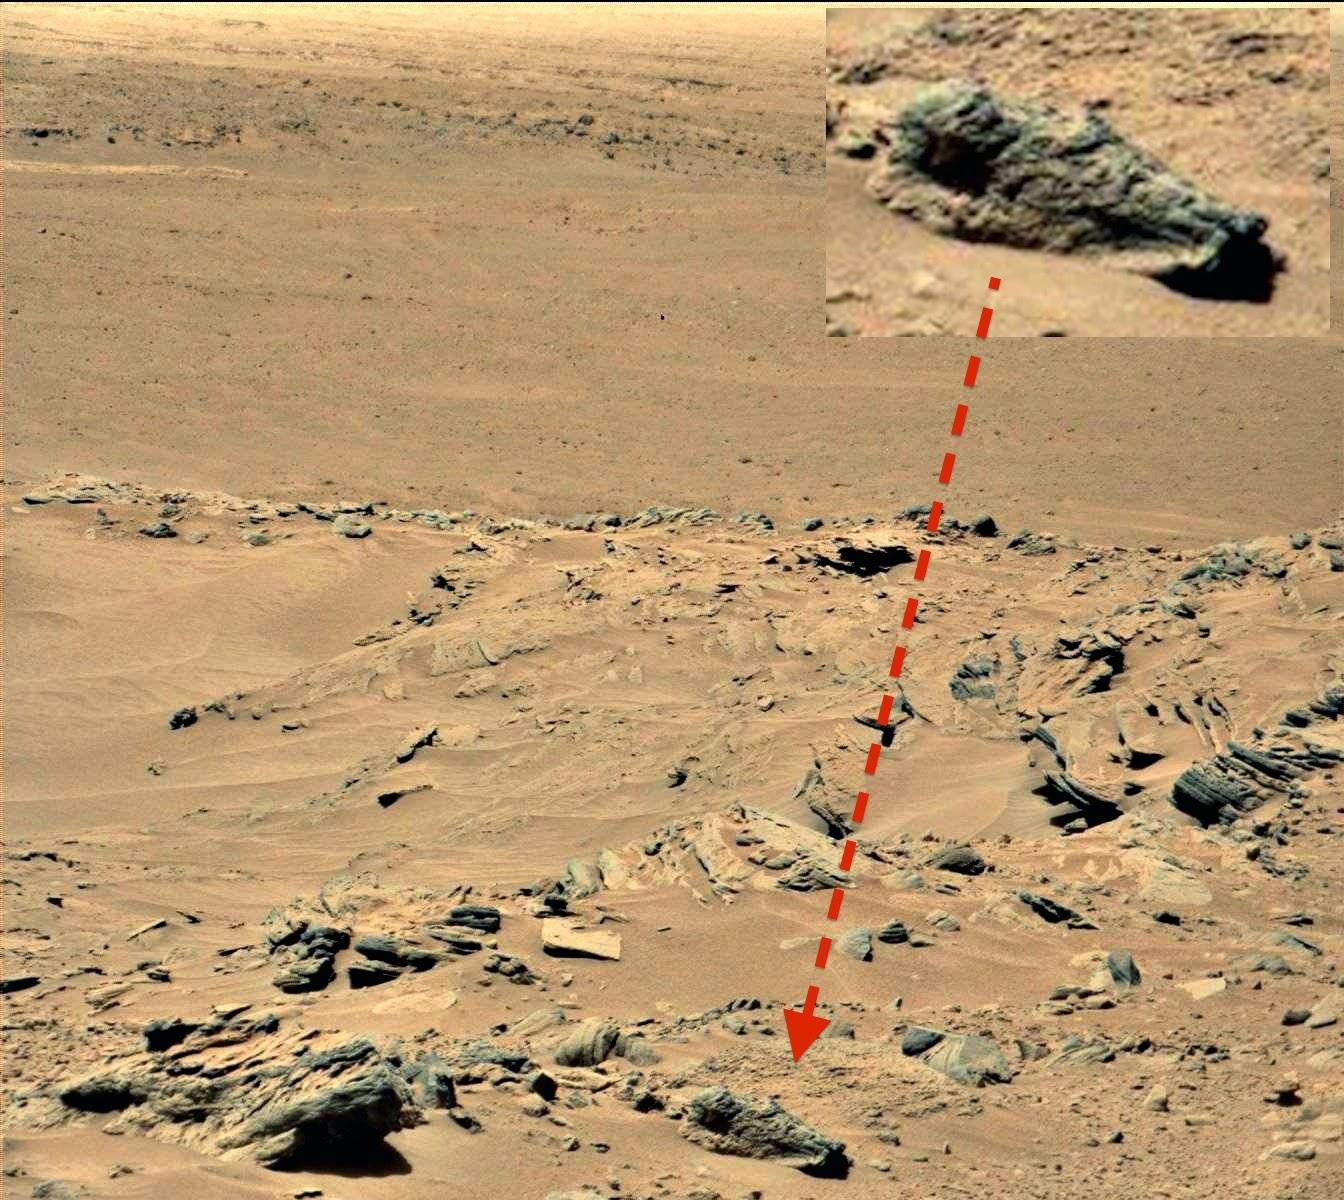 report on mars nasa - photo #9